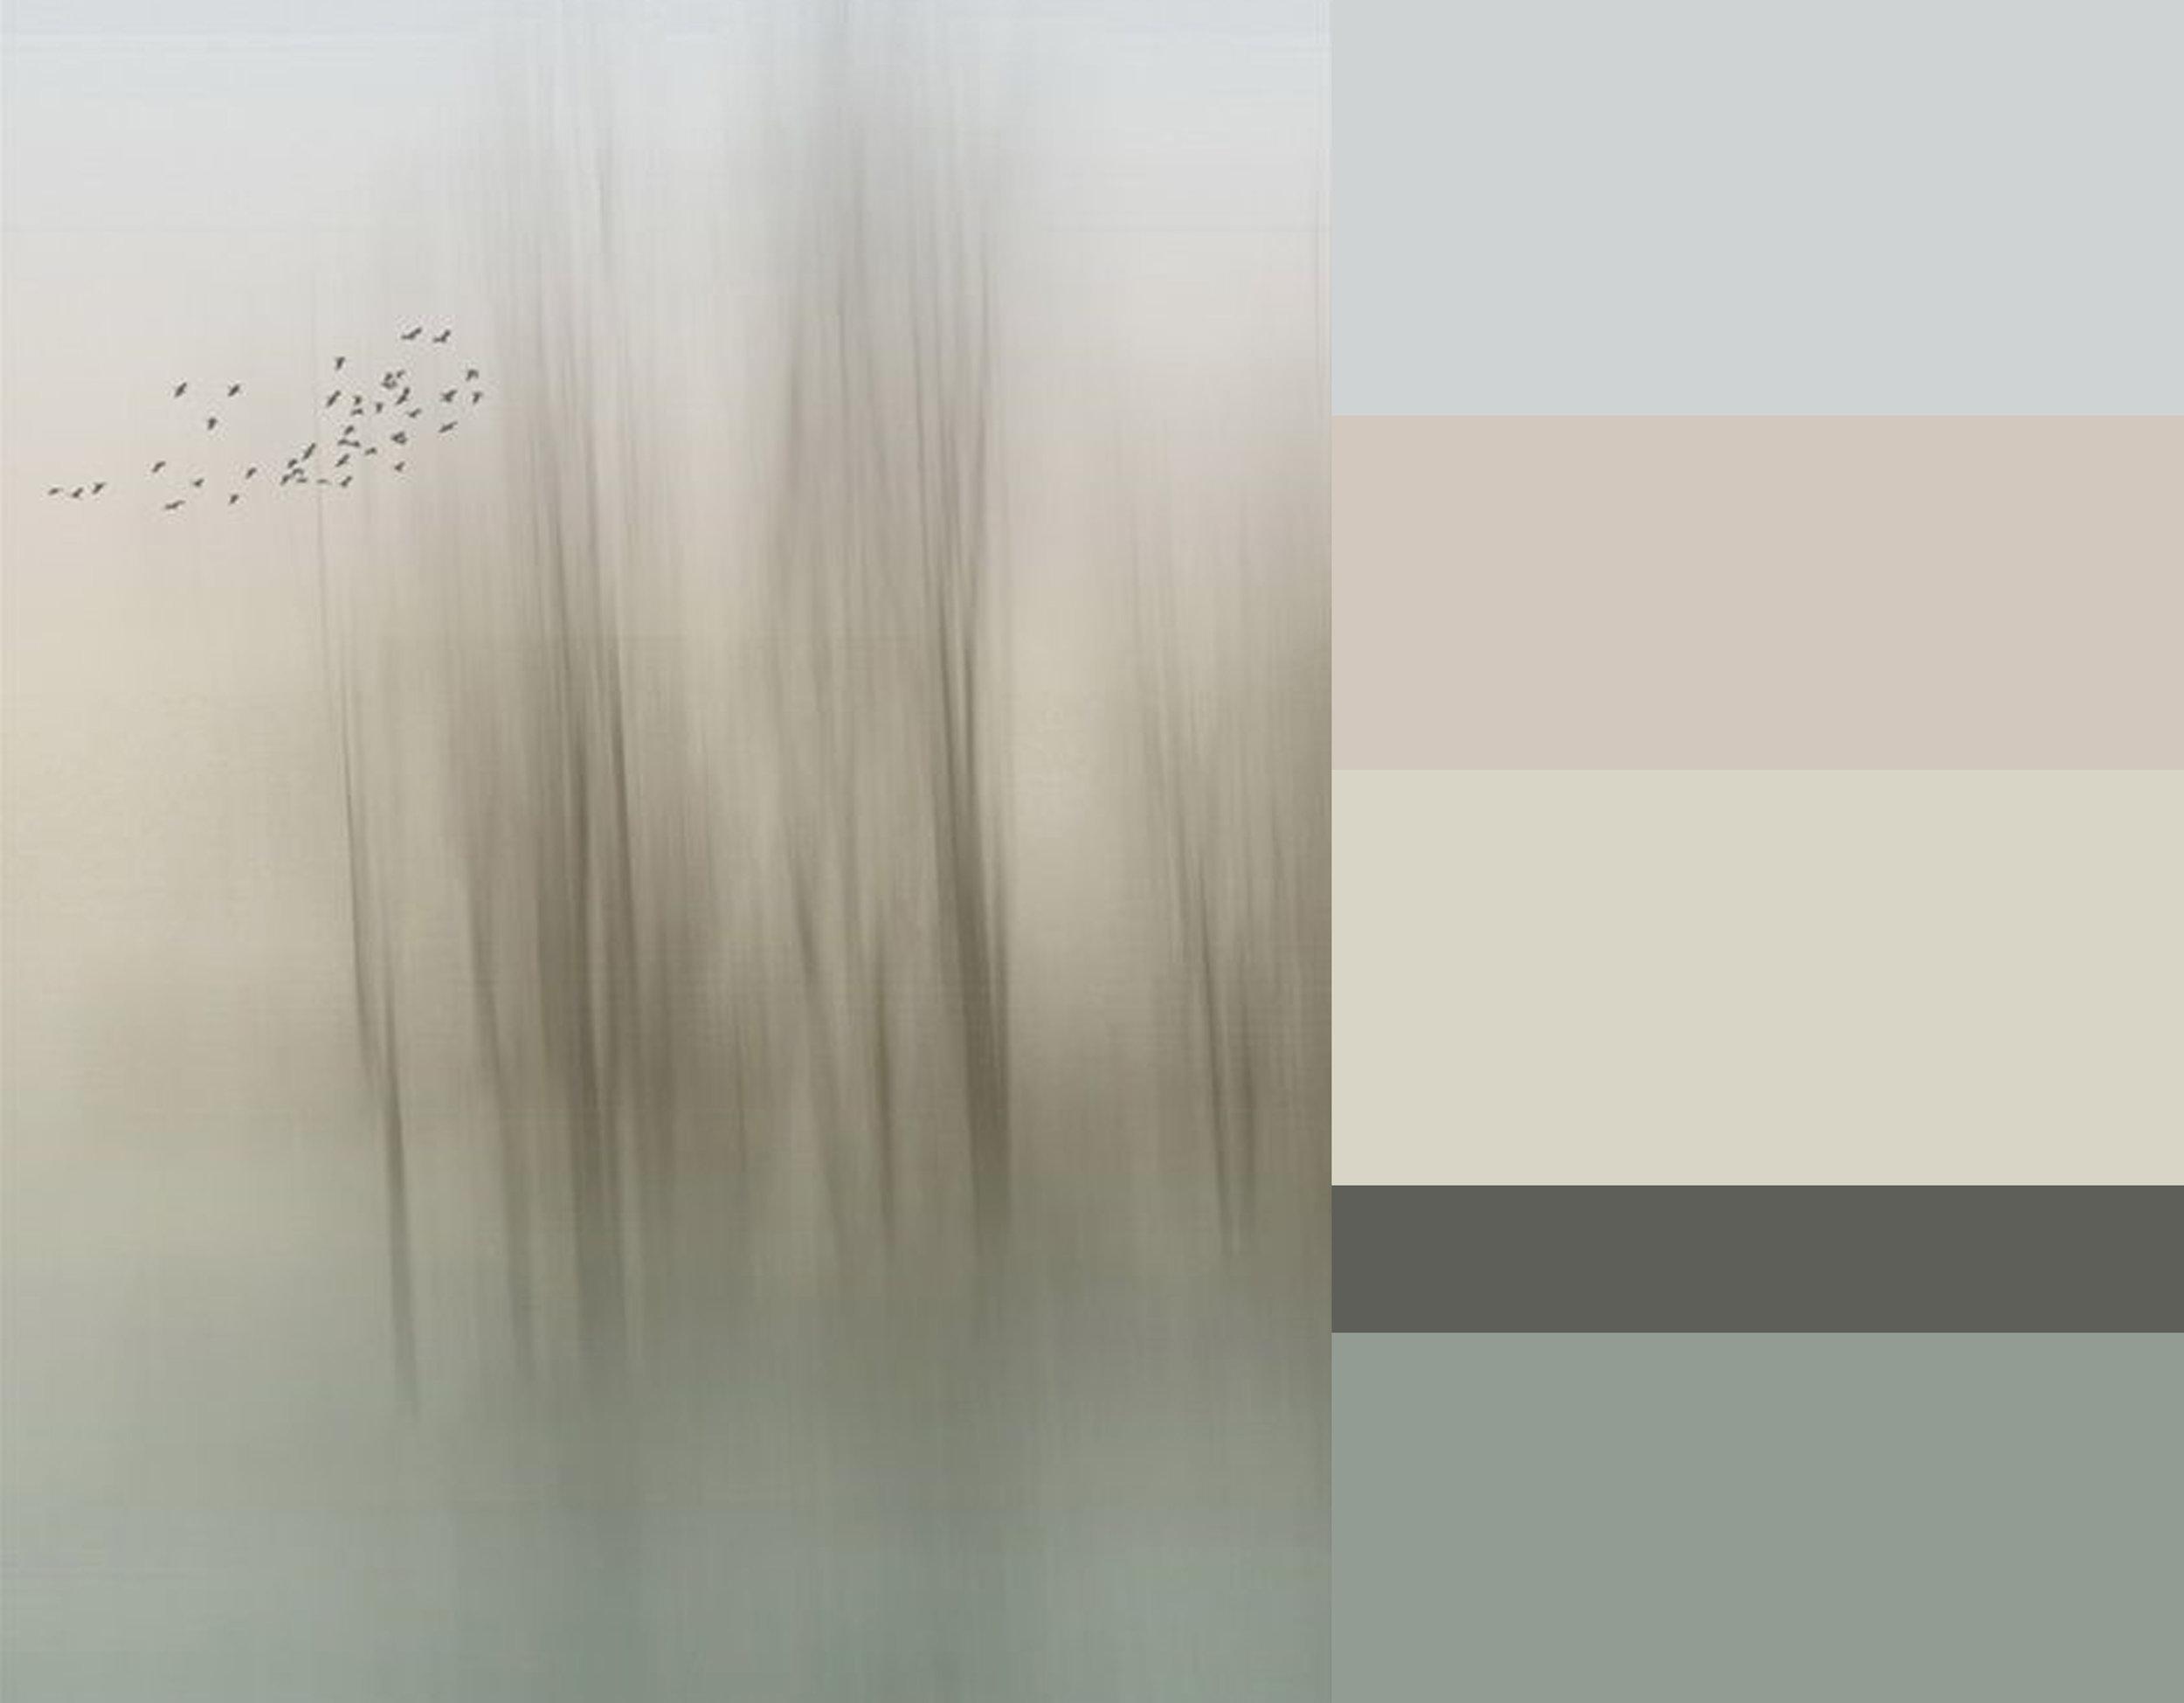 Breeze of Winter via  Fotoblur  - colors from top down Skylight 205  Farrow & Ball  - Coquette Lt. 146  Sanderson  - Silverflake 7  Sanderson  - Bastille 165  Sanderson  - Double la Seine  Farrow & Ball